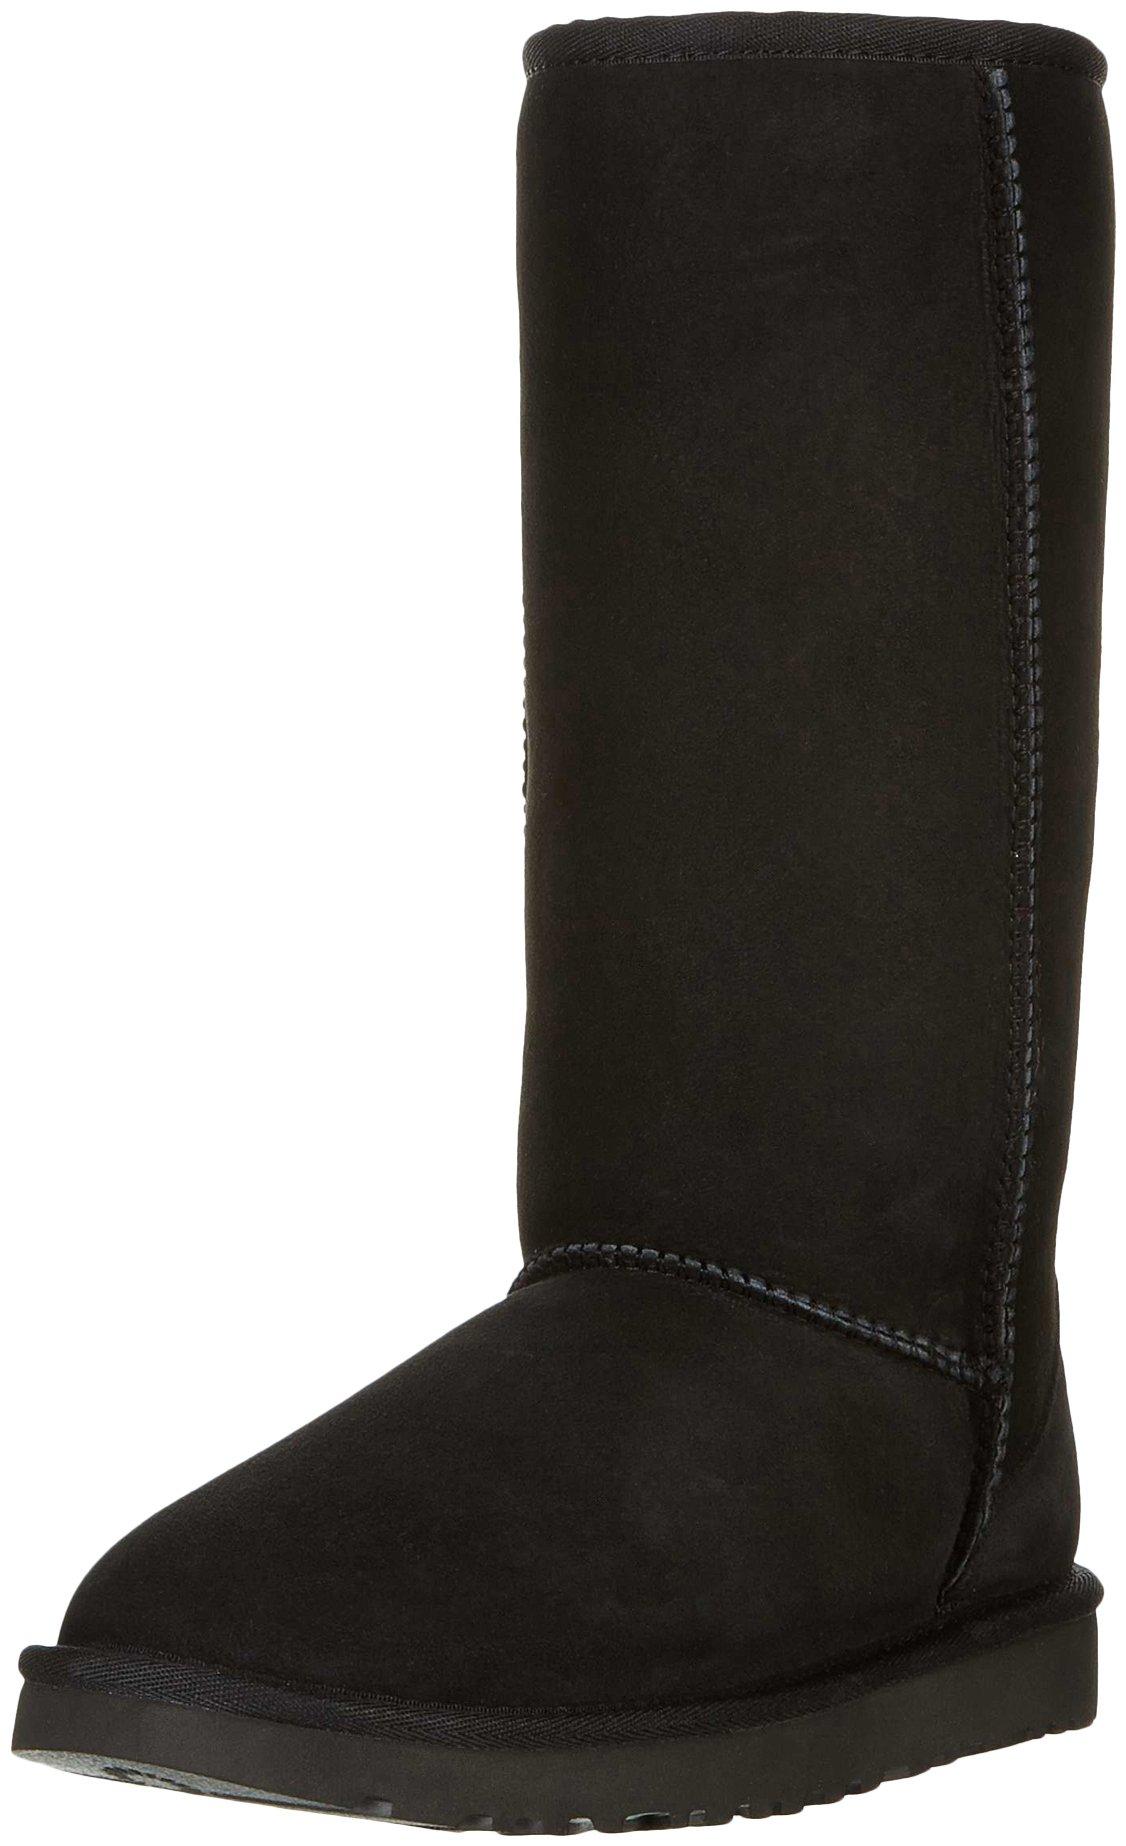 black ugg boots amazon com rh amazon com